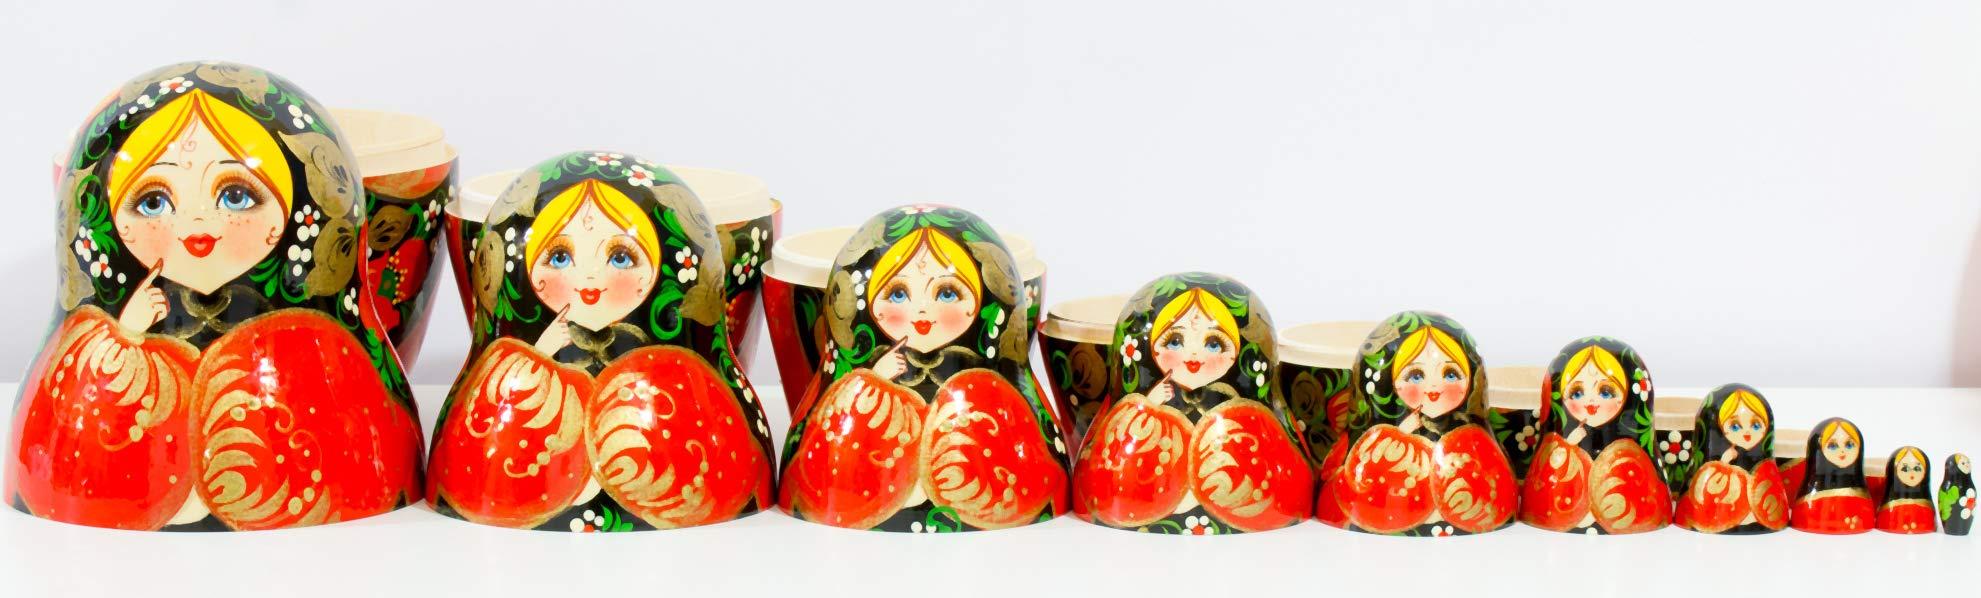 Russian Nesting Doll - Kirov - VJATKA - Hand Painted in Russia - Big Size - Wooden Decoration Gift Doll - Matryoshka Babushka (Style C, 8.25``(10 Dolls in 1)) by craftsfromrussia (Image #4)